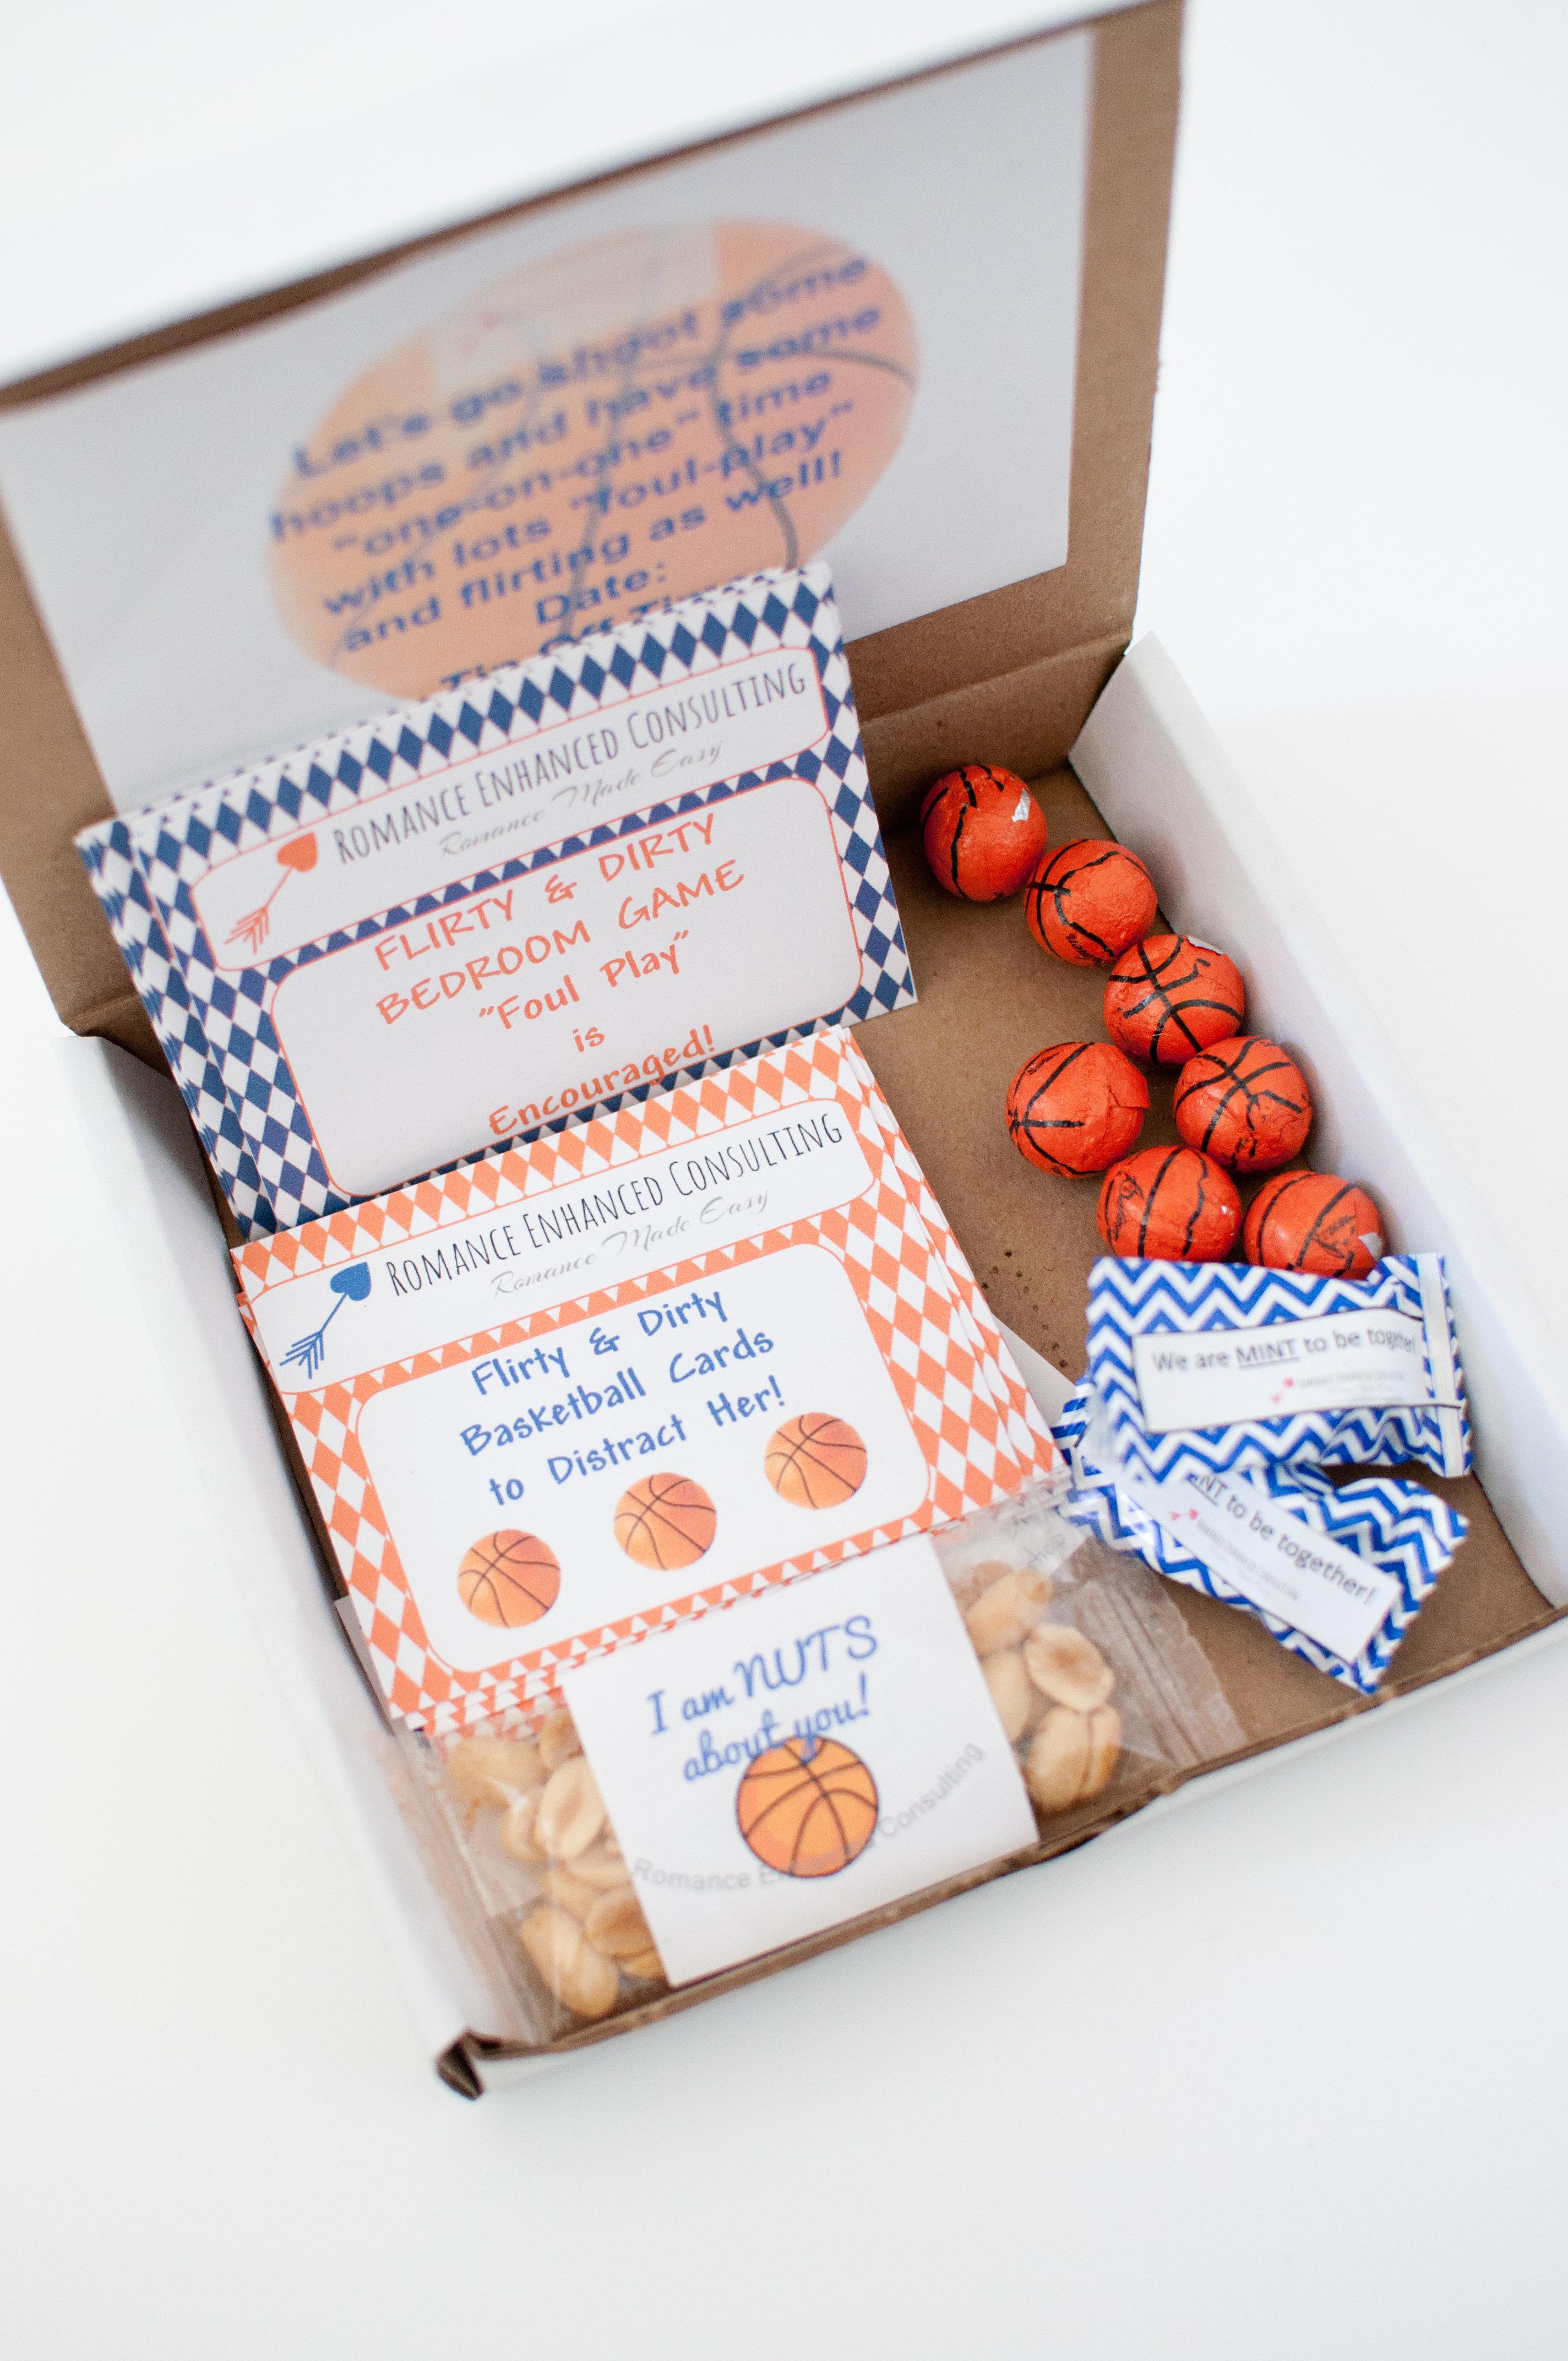 Gift For Him Flirty Dirty Basketball Bedroom Game Romance Enhanced